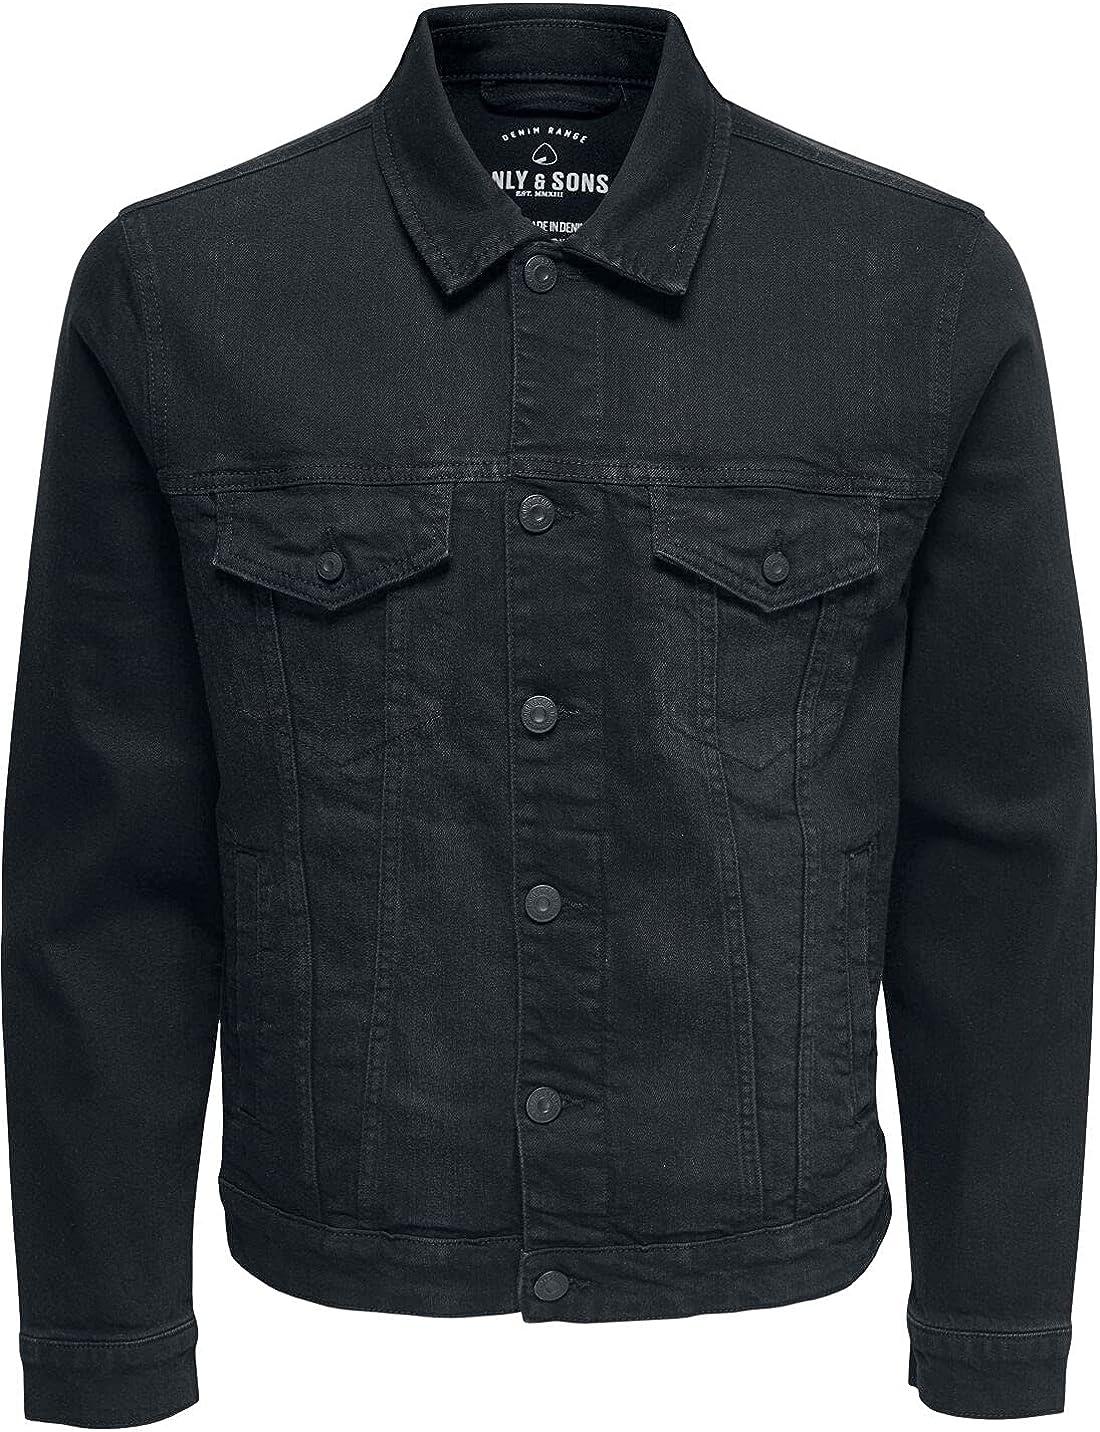 Only Sons NEW before selling Men's Onscoin Black Pk 0453 Jacket online shop Denim